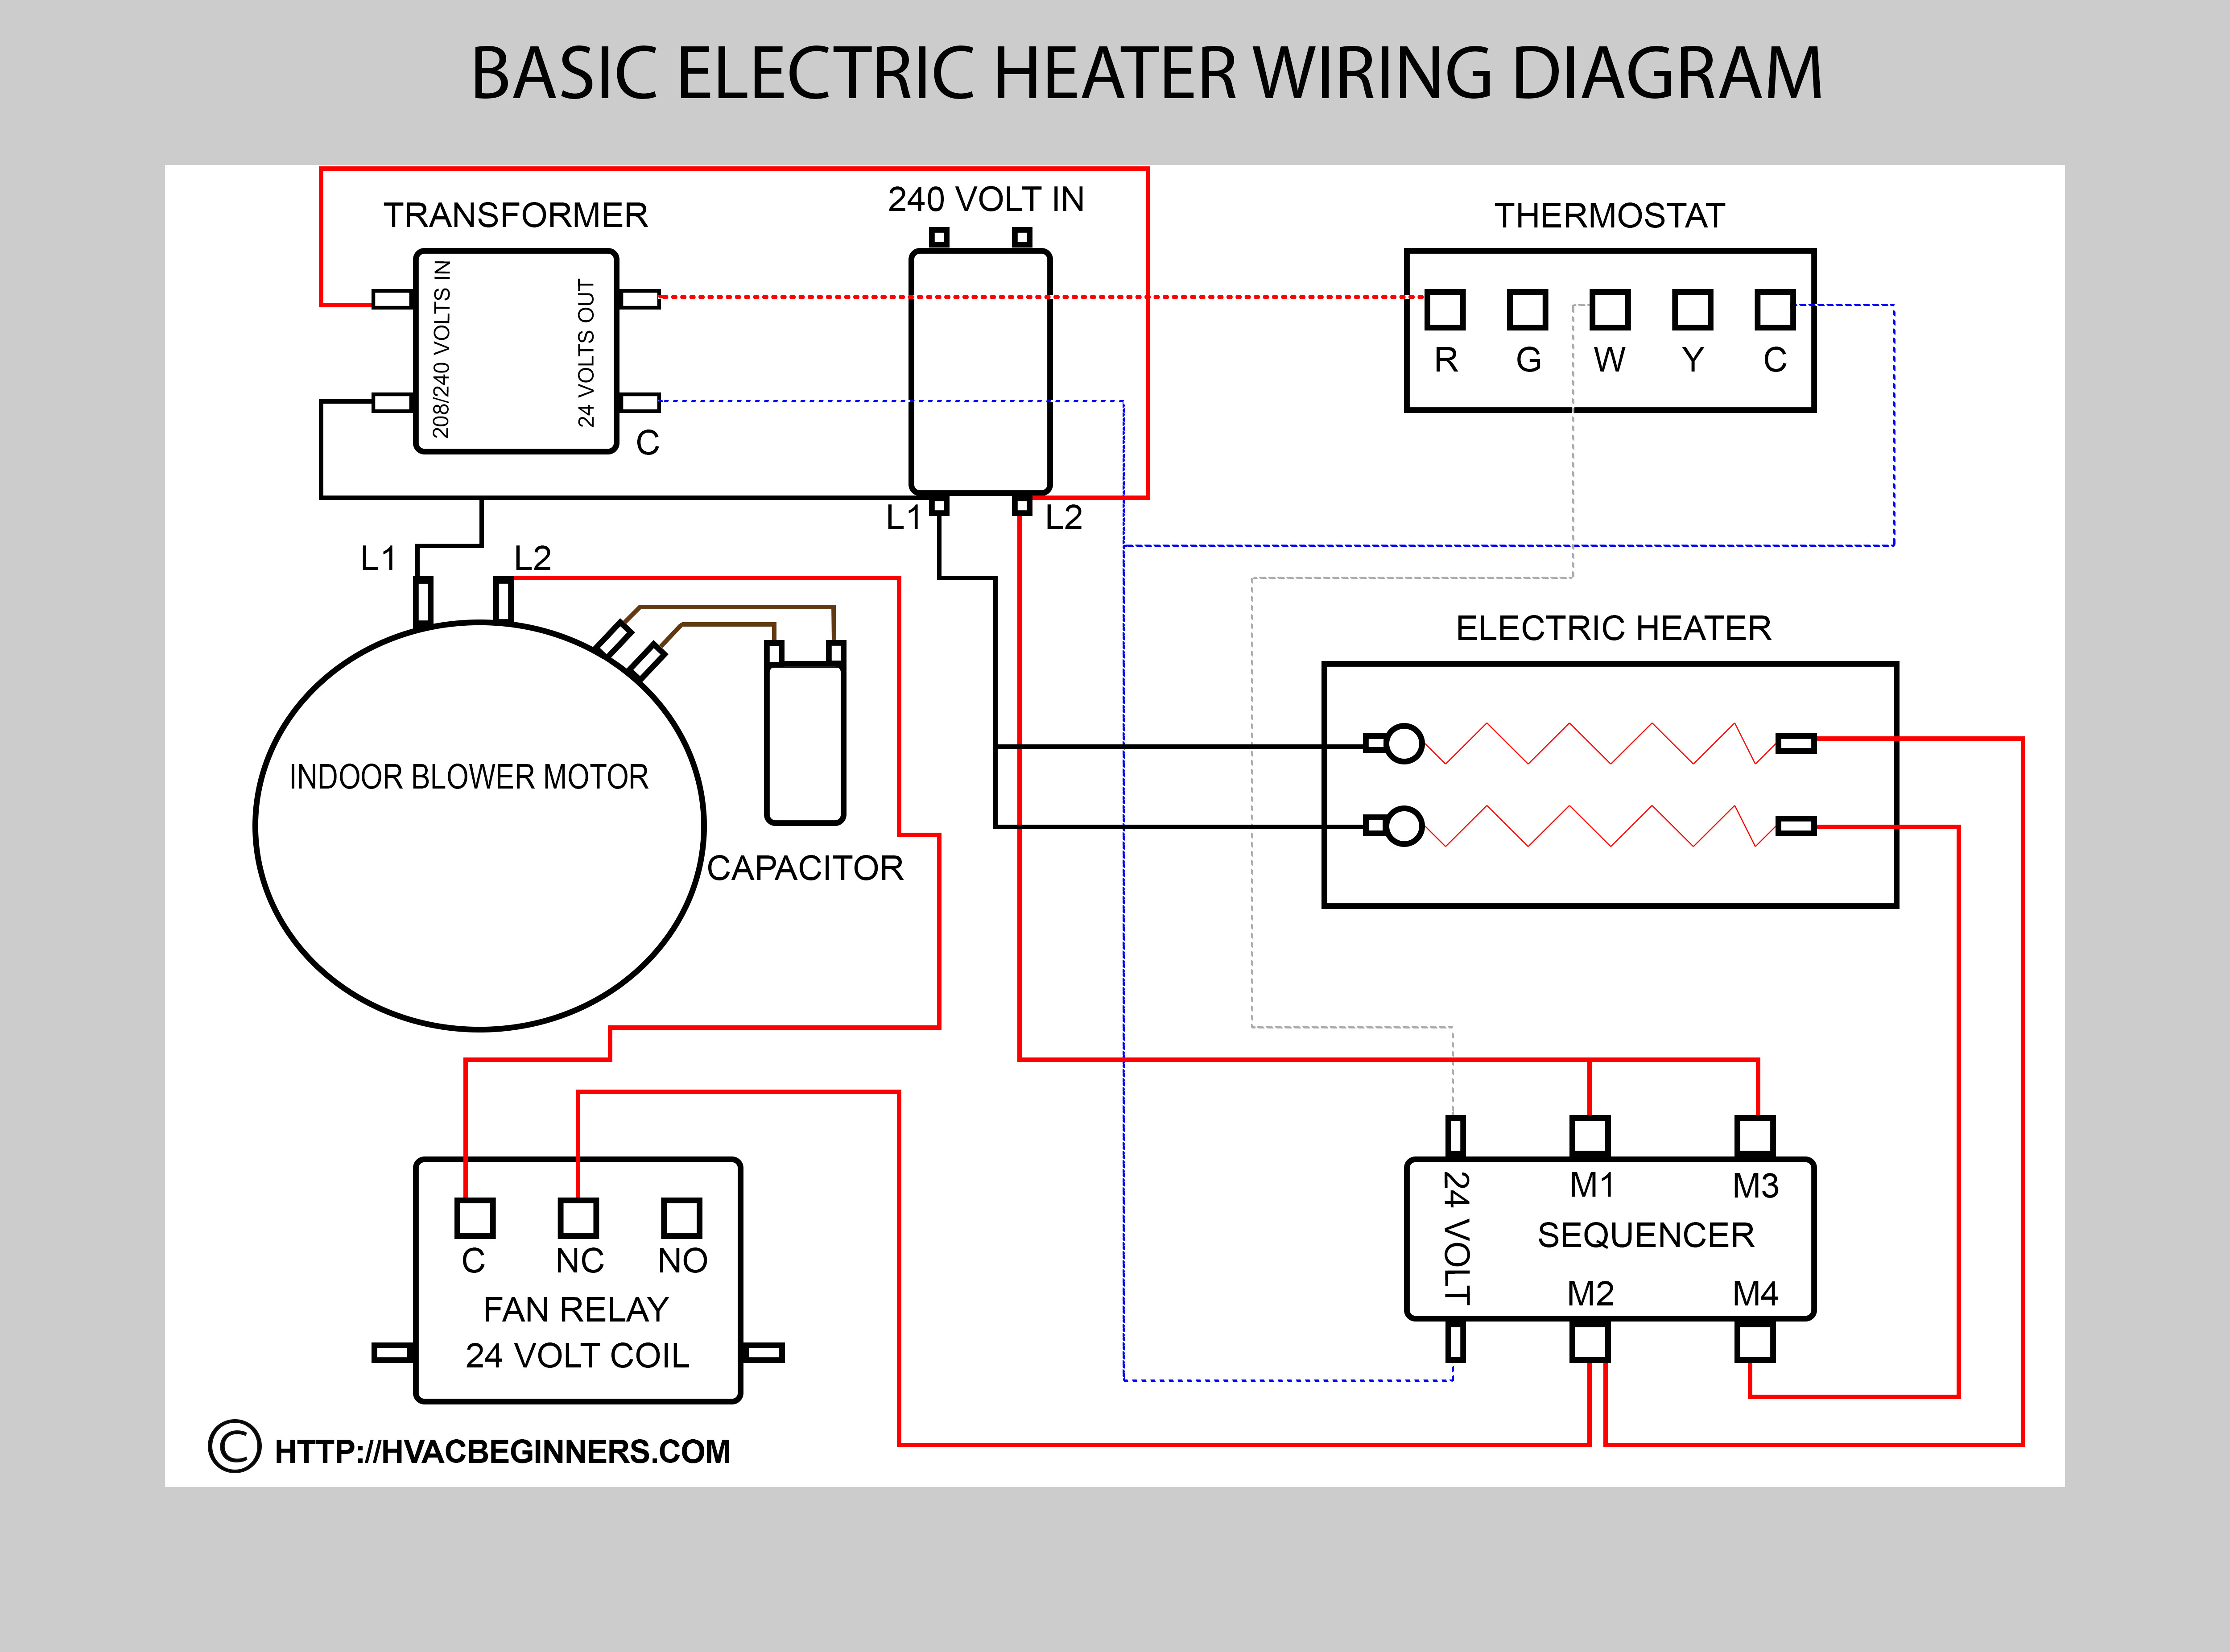 Ac Air Handler Fan Relay Wiring Diagram | Wiring Diagram - Air Handler Fan Relay Wiring Diagram